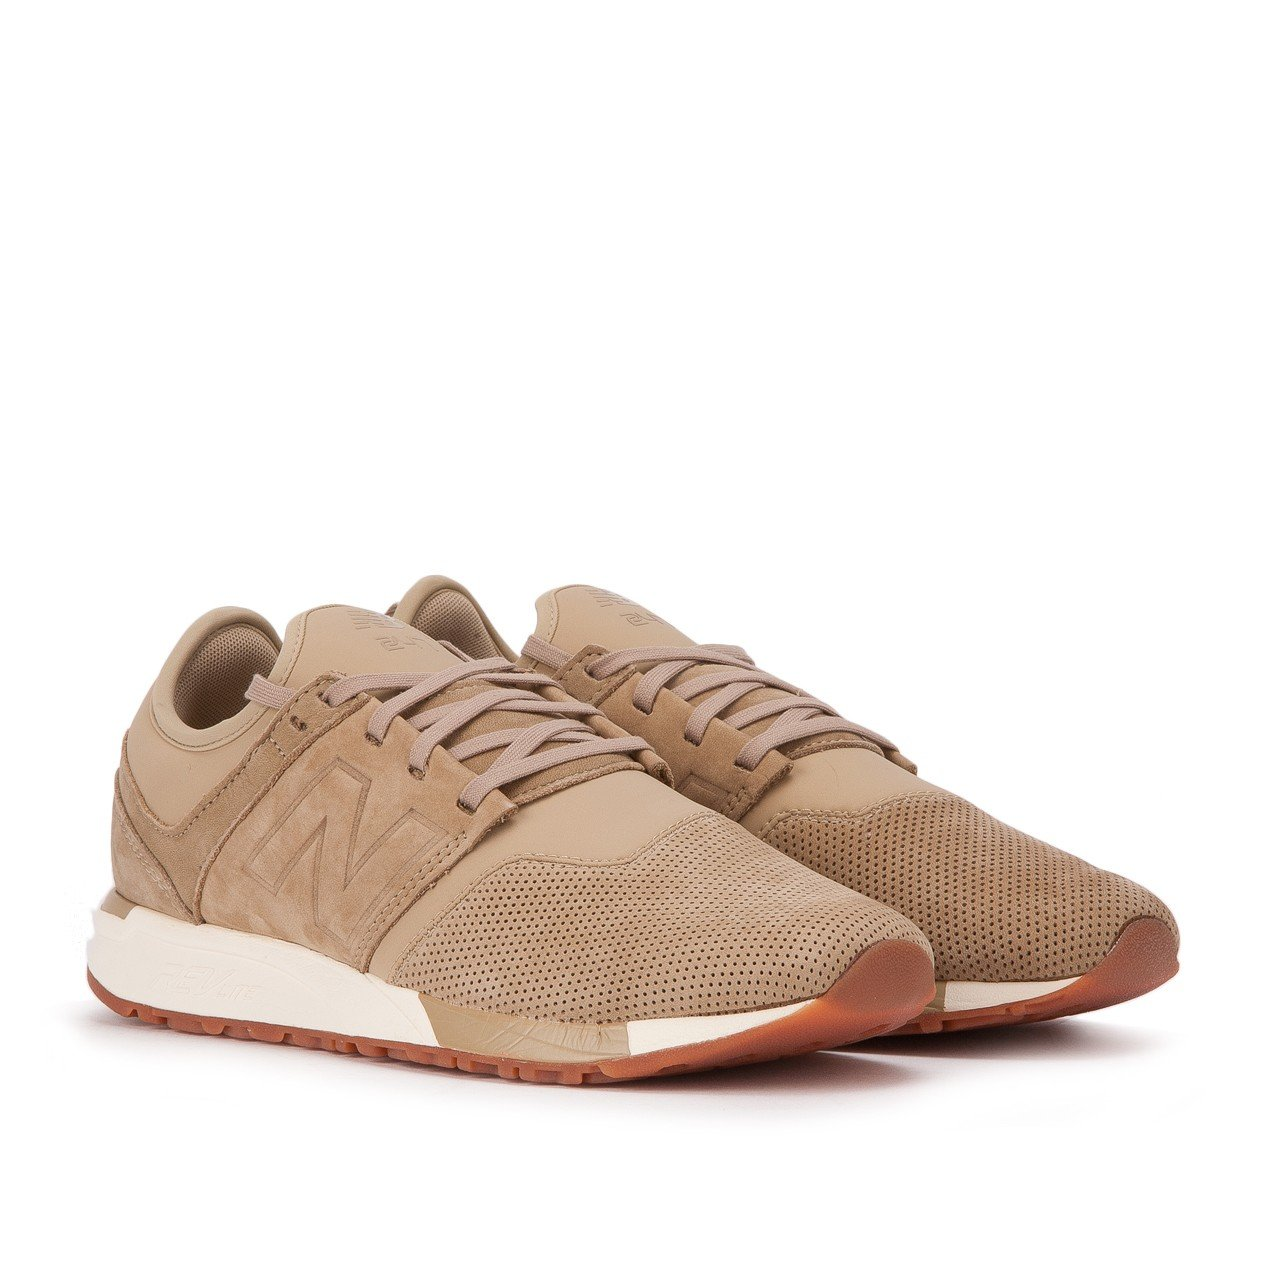 New Balance Herren 247 Classic Mesh Sneaker  46.5 EU|hemp/vert